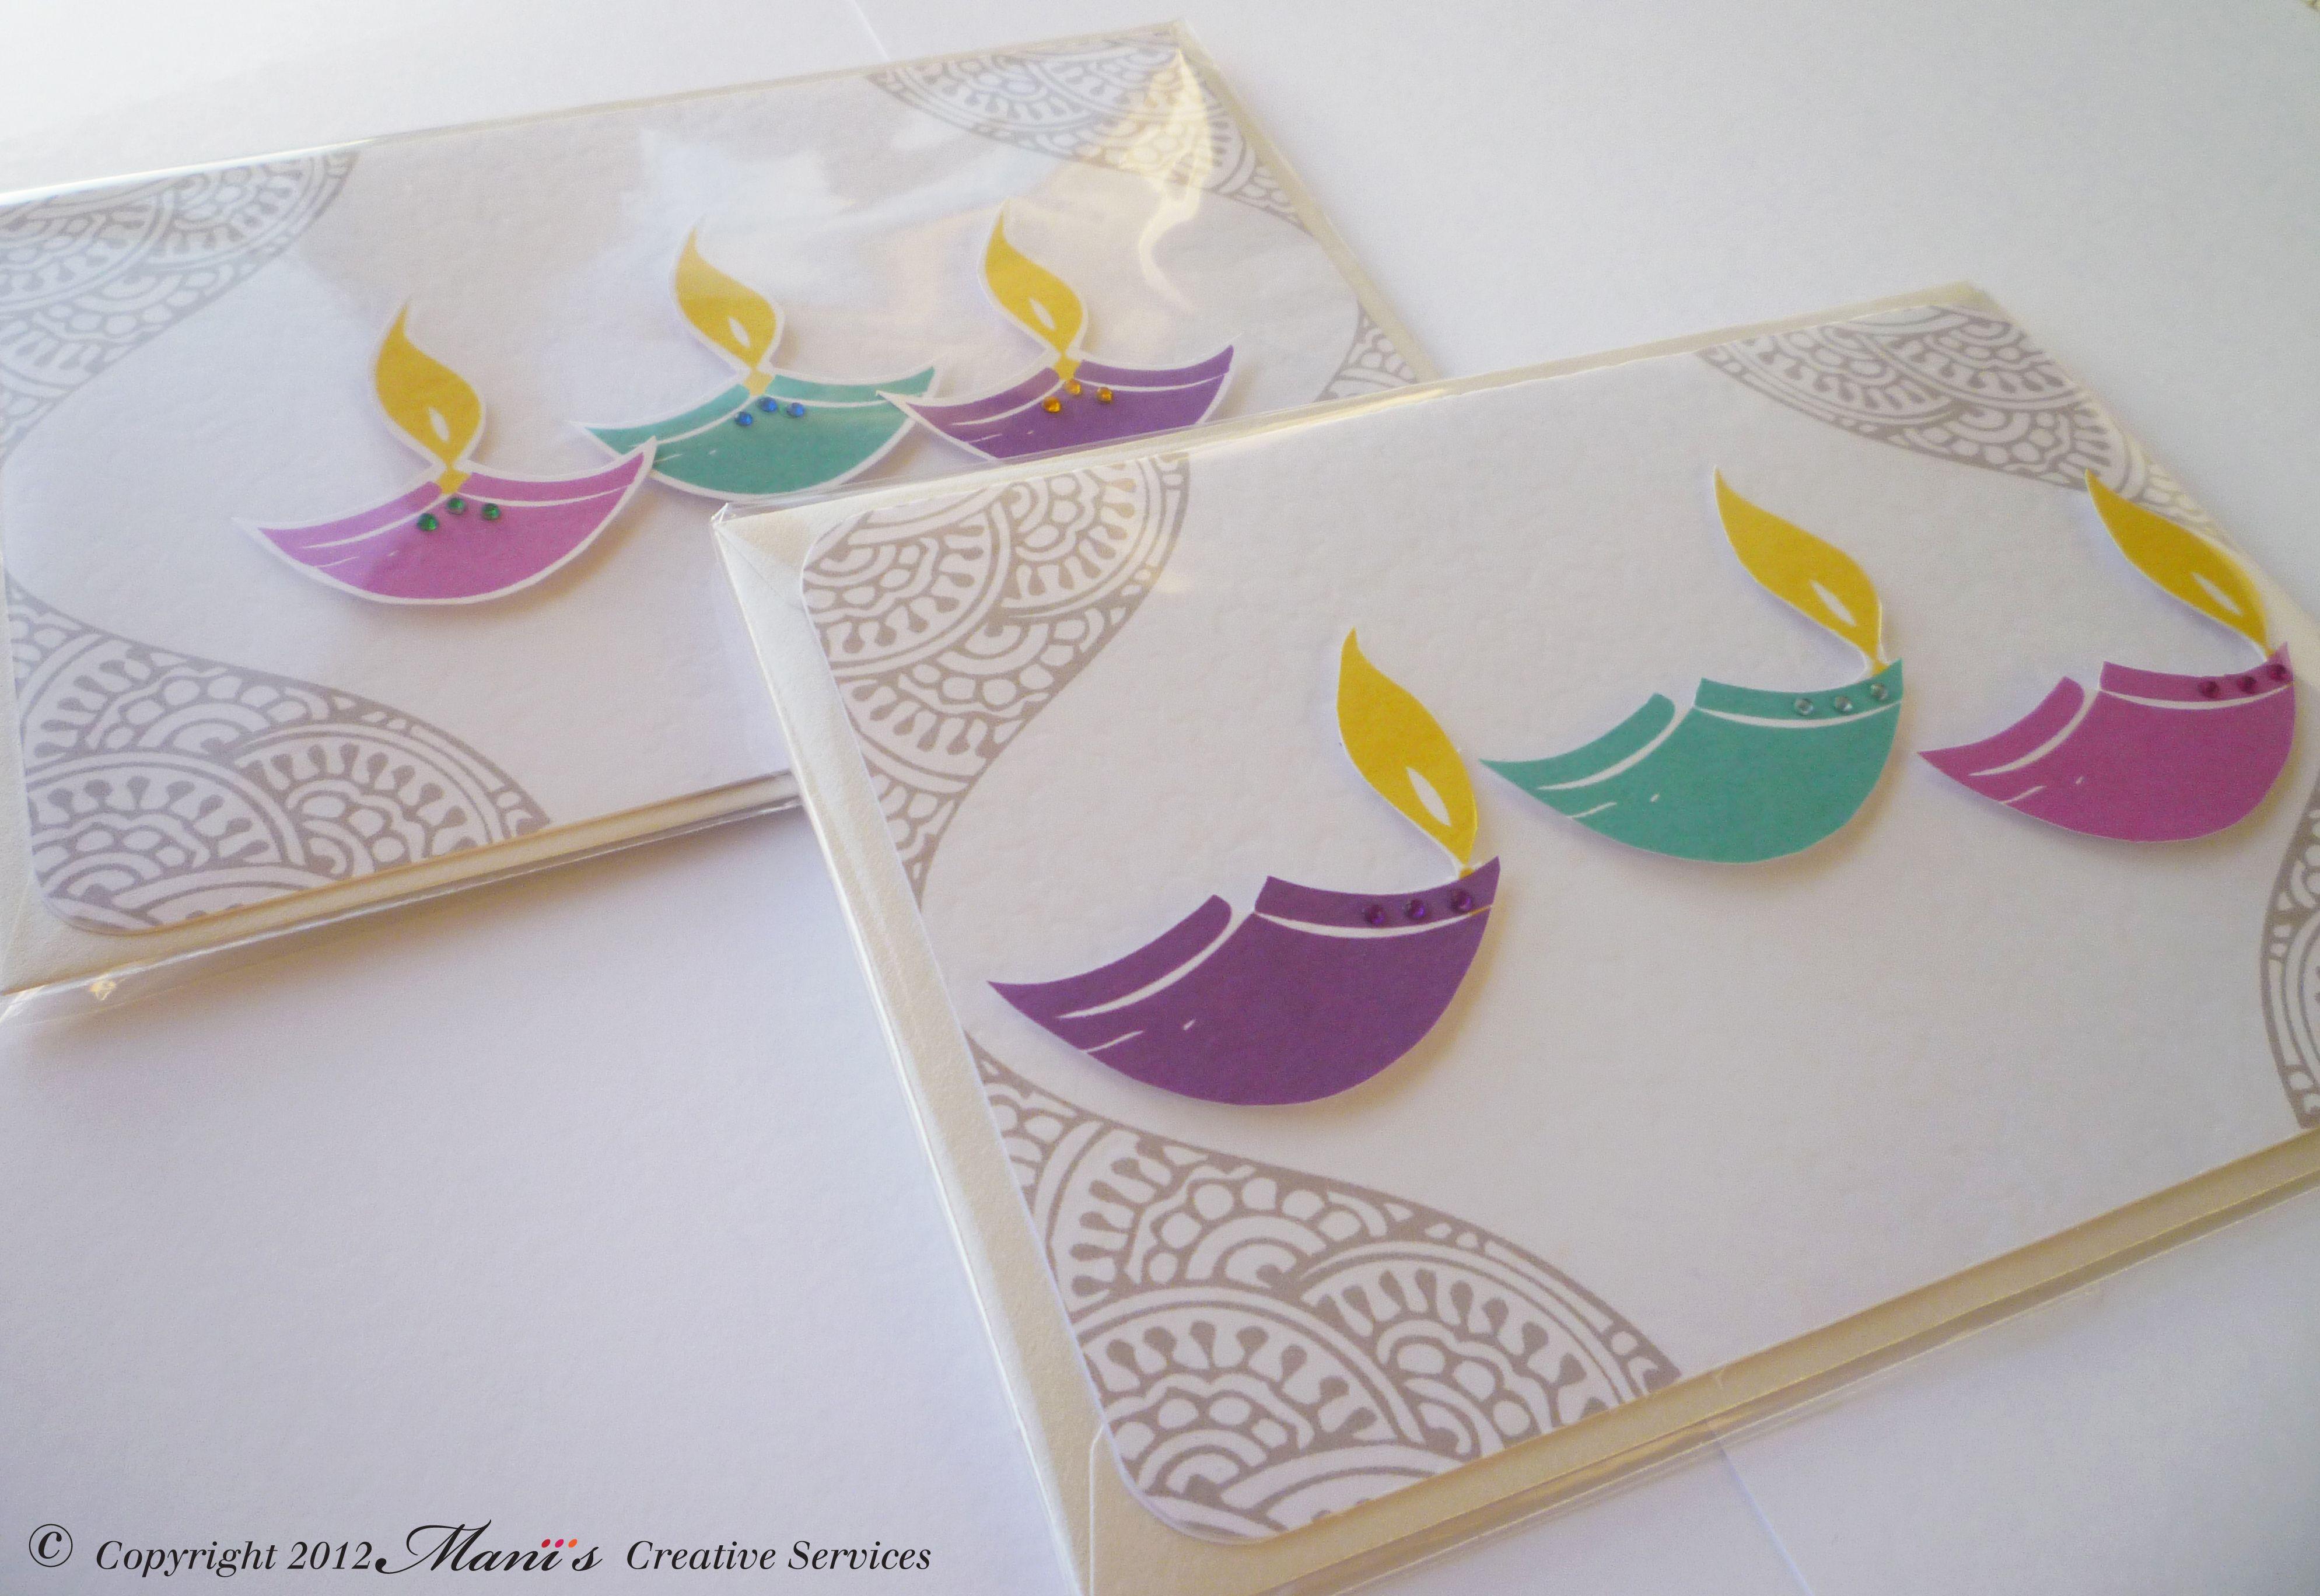 Card Making Ideas For Diwali Part - 27: Handmade Diwali Cards